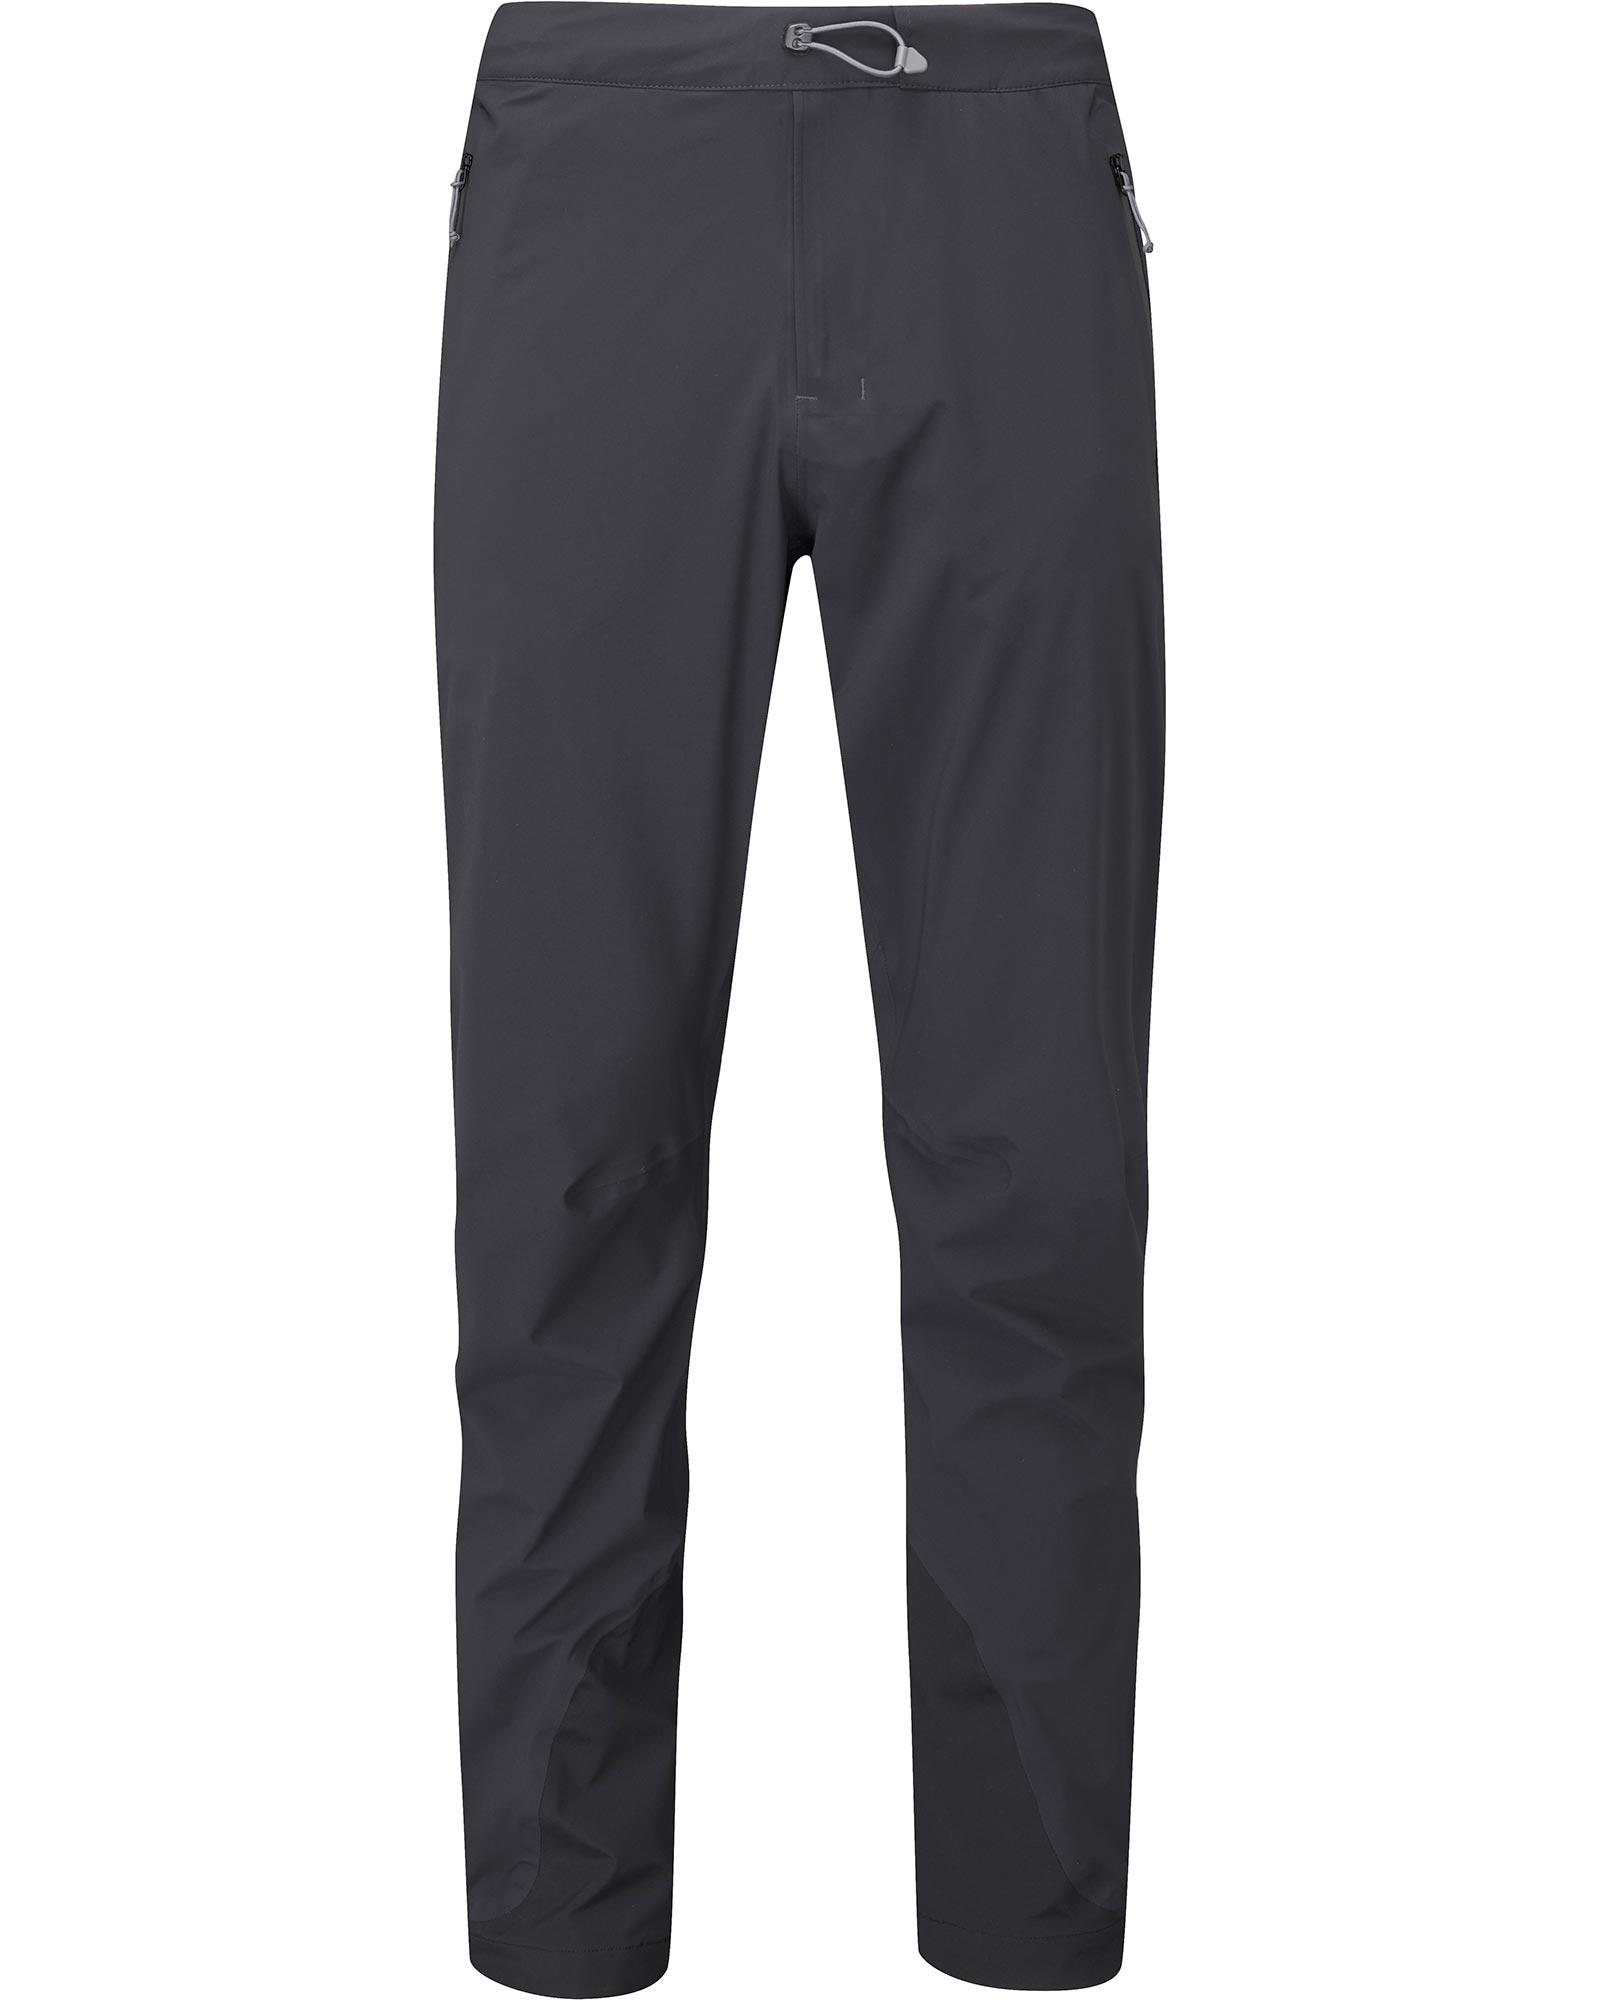 Rab Men's Kinetic 2.0 Pants 0